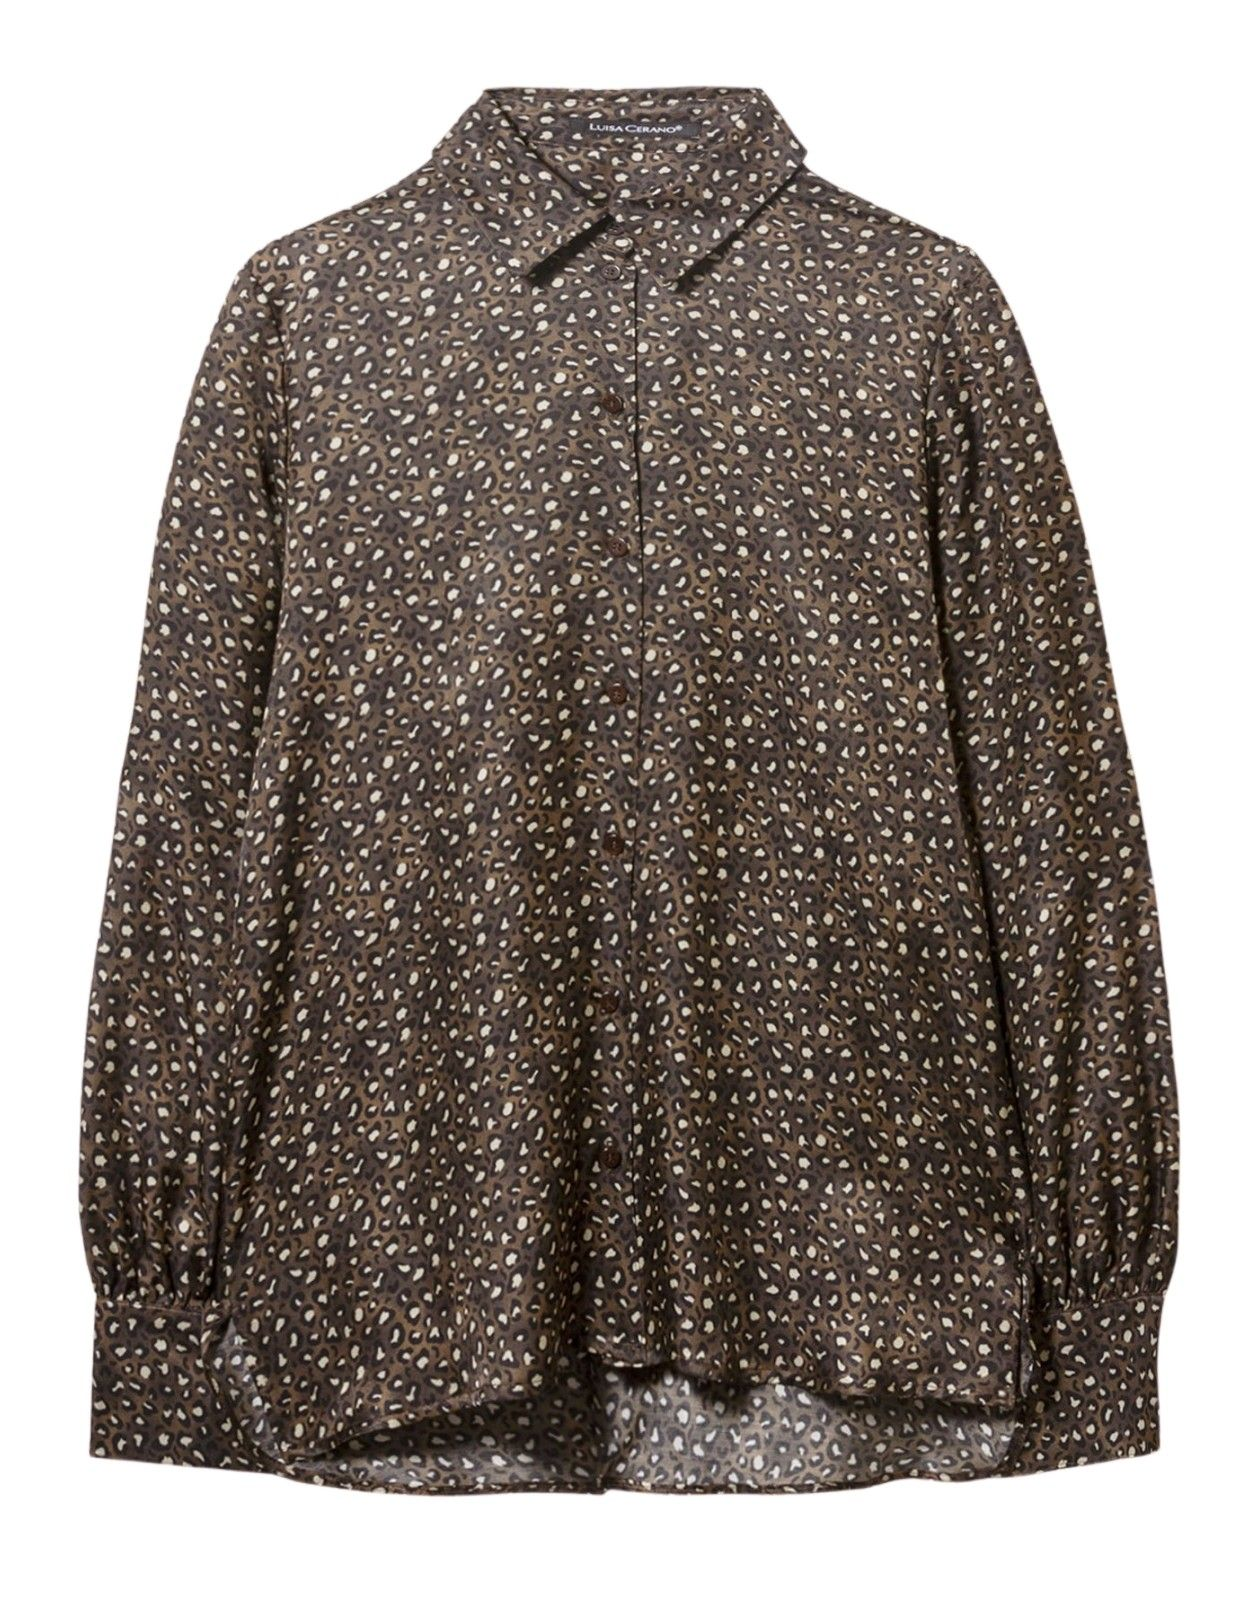 LUISA CERANO - Damen Bluse - Bluse mit Fantasy-Animal Print-Multi